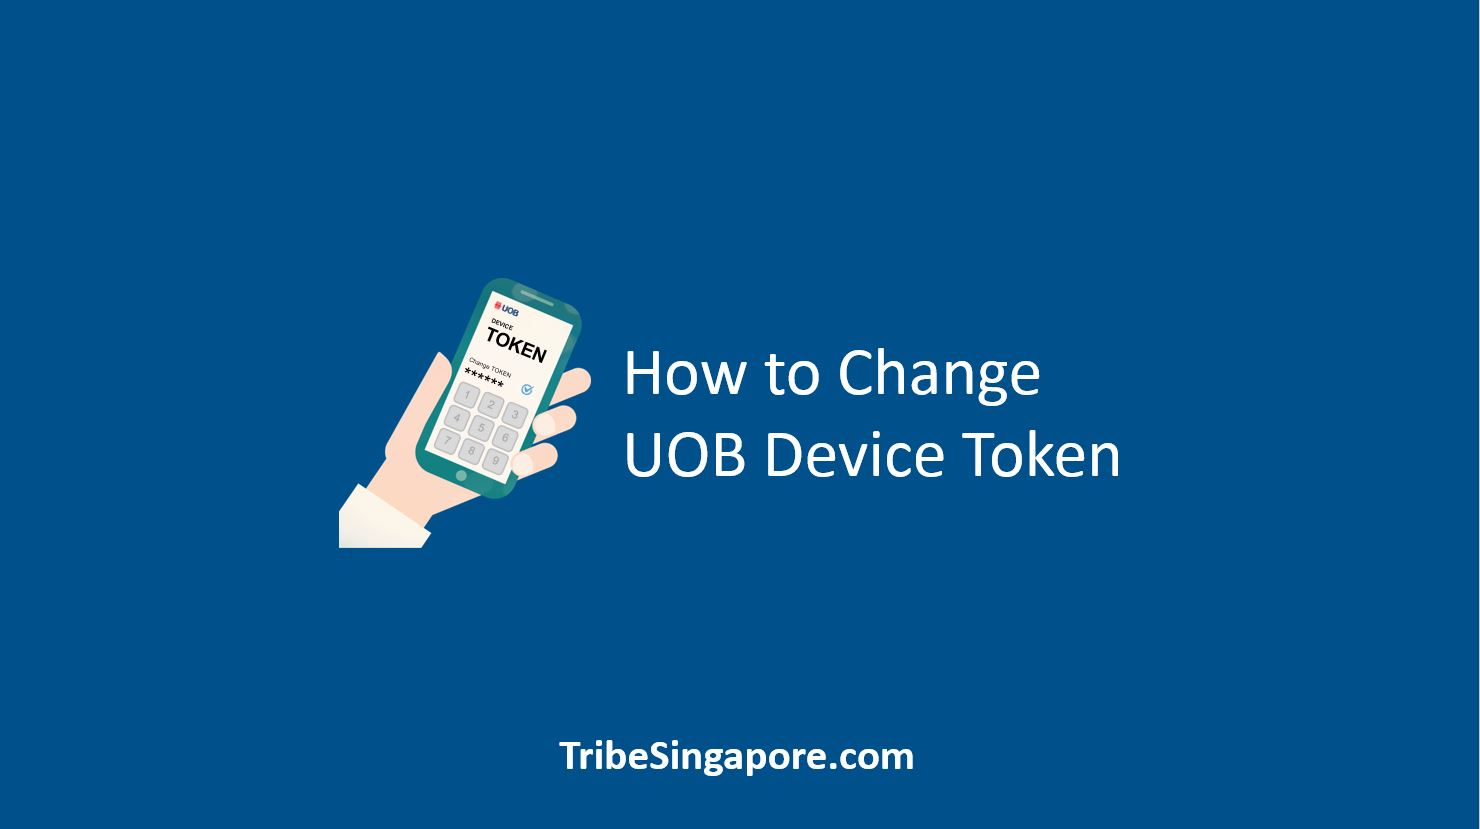 How to Change UOB Device Token